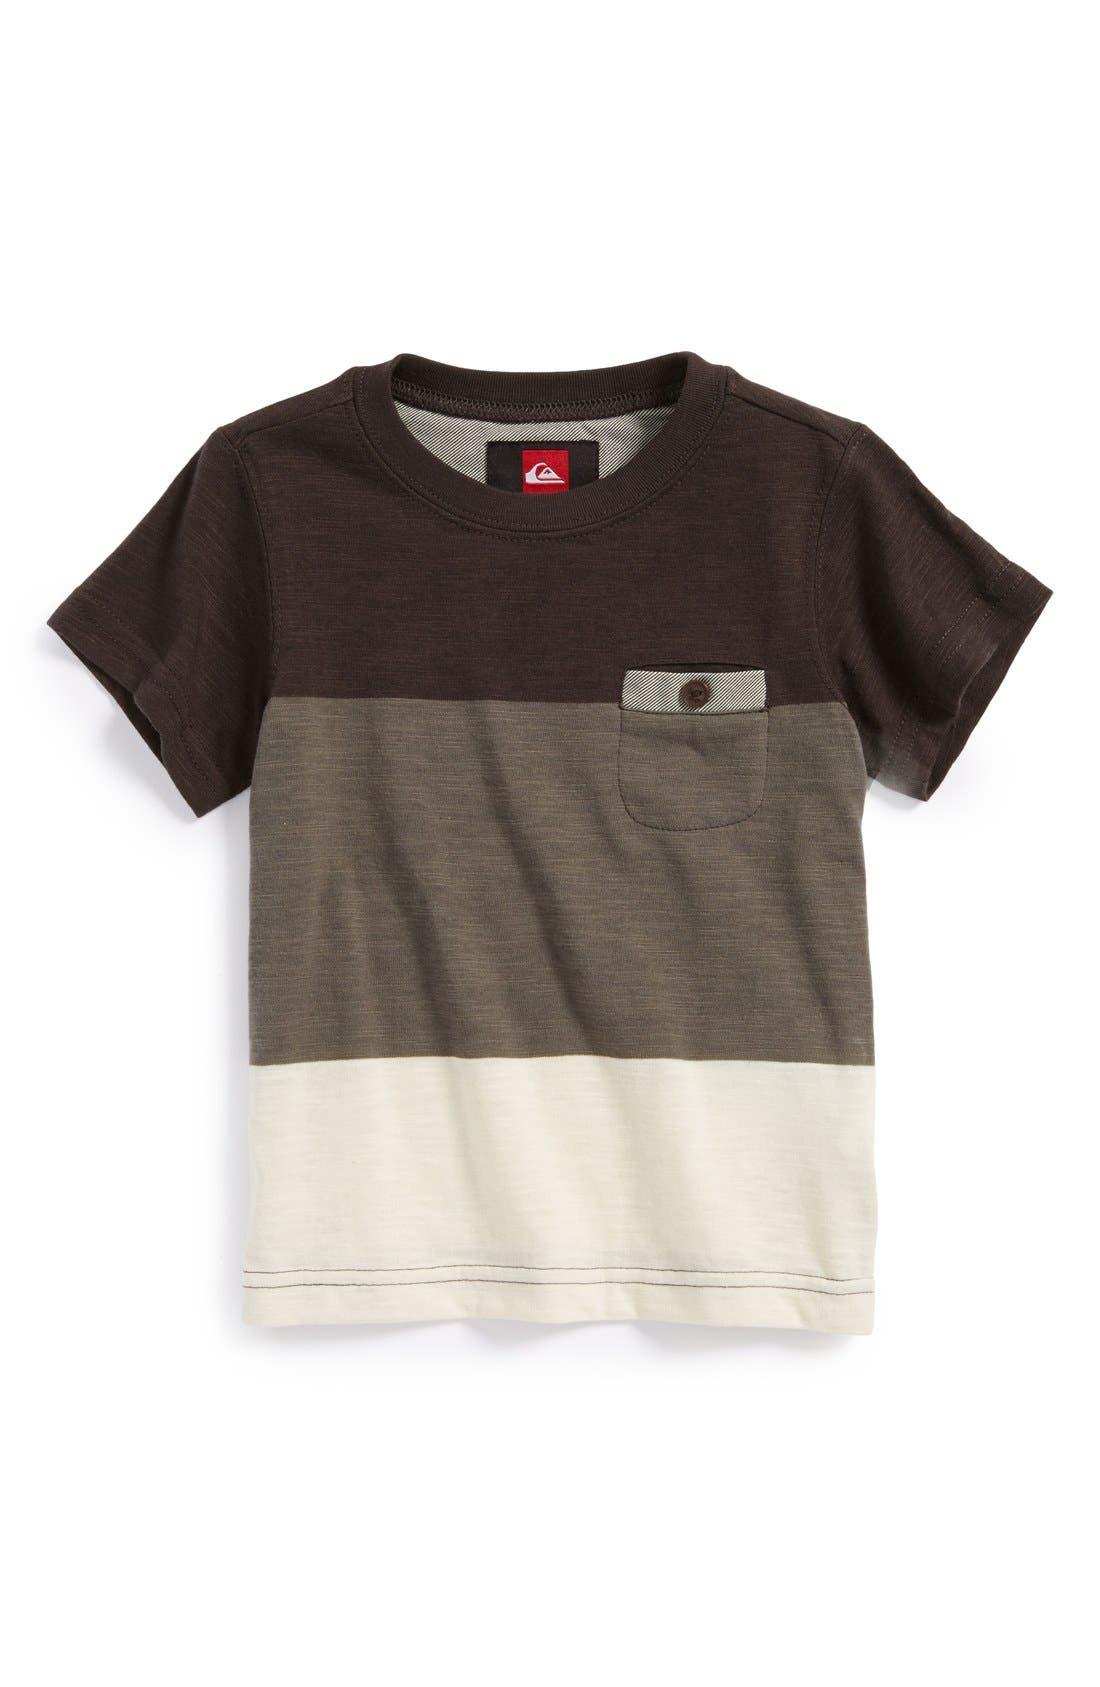 Alternate Image 1 Selected - Quiksilver 'Half Pint' Slub T-Shirt (Toddler Boys)